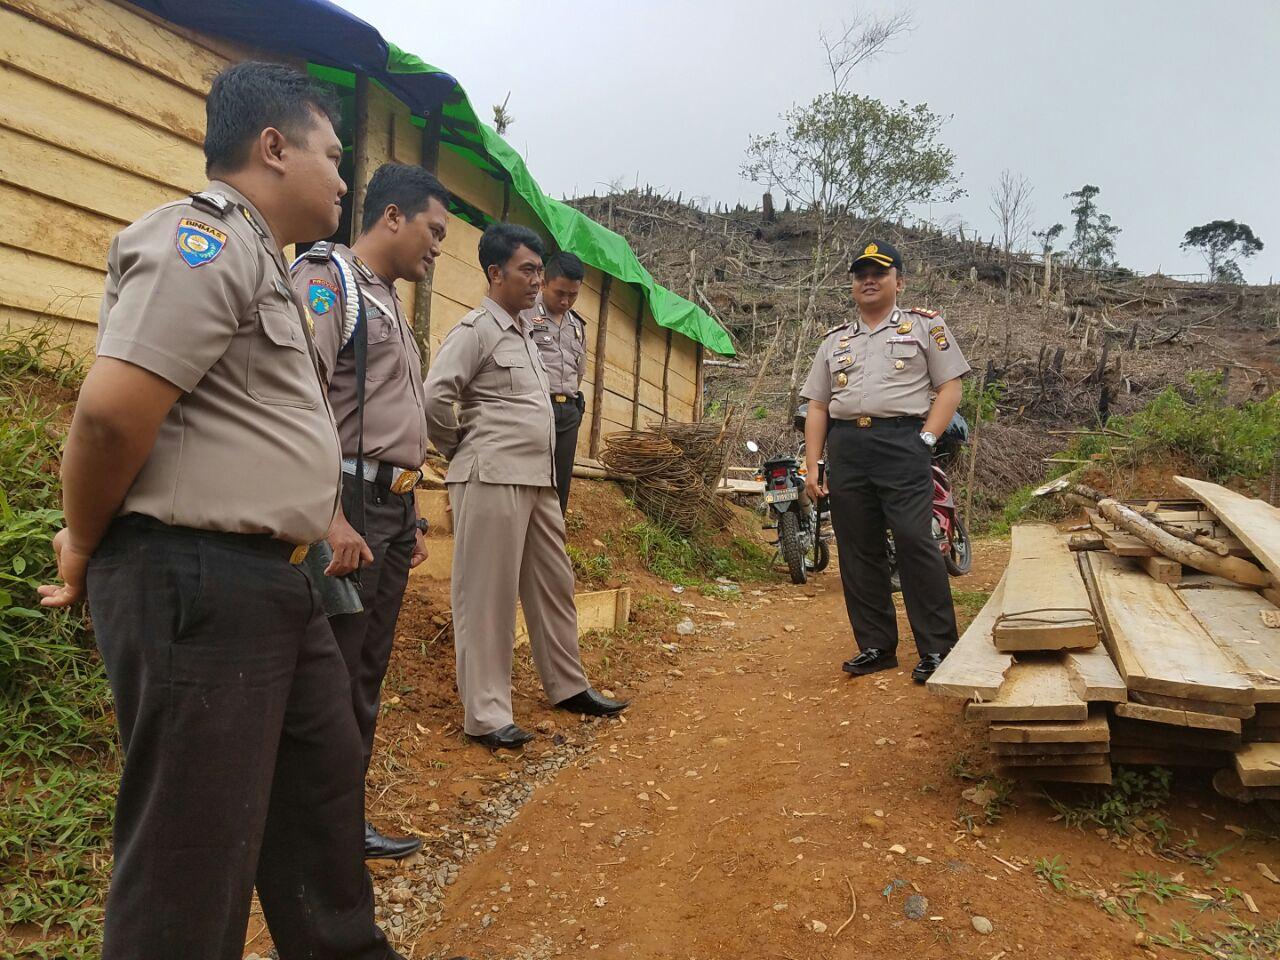 Kapolres Cek Personil Pengamanan Tapal Batas Bengkulu Utara Dengan Lebong